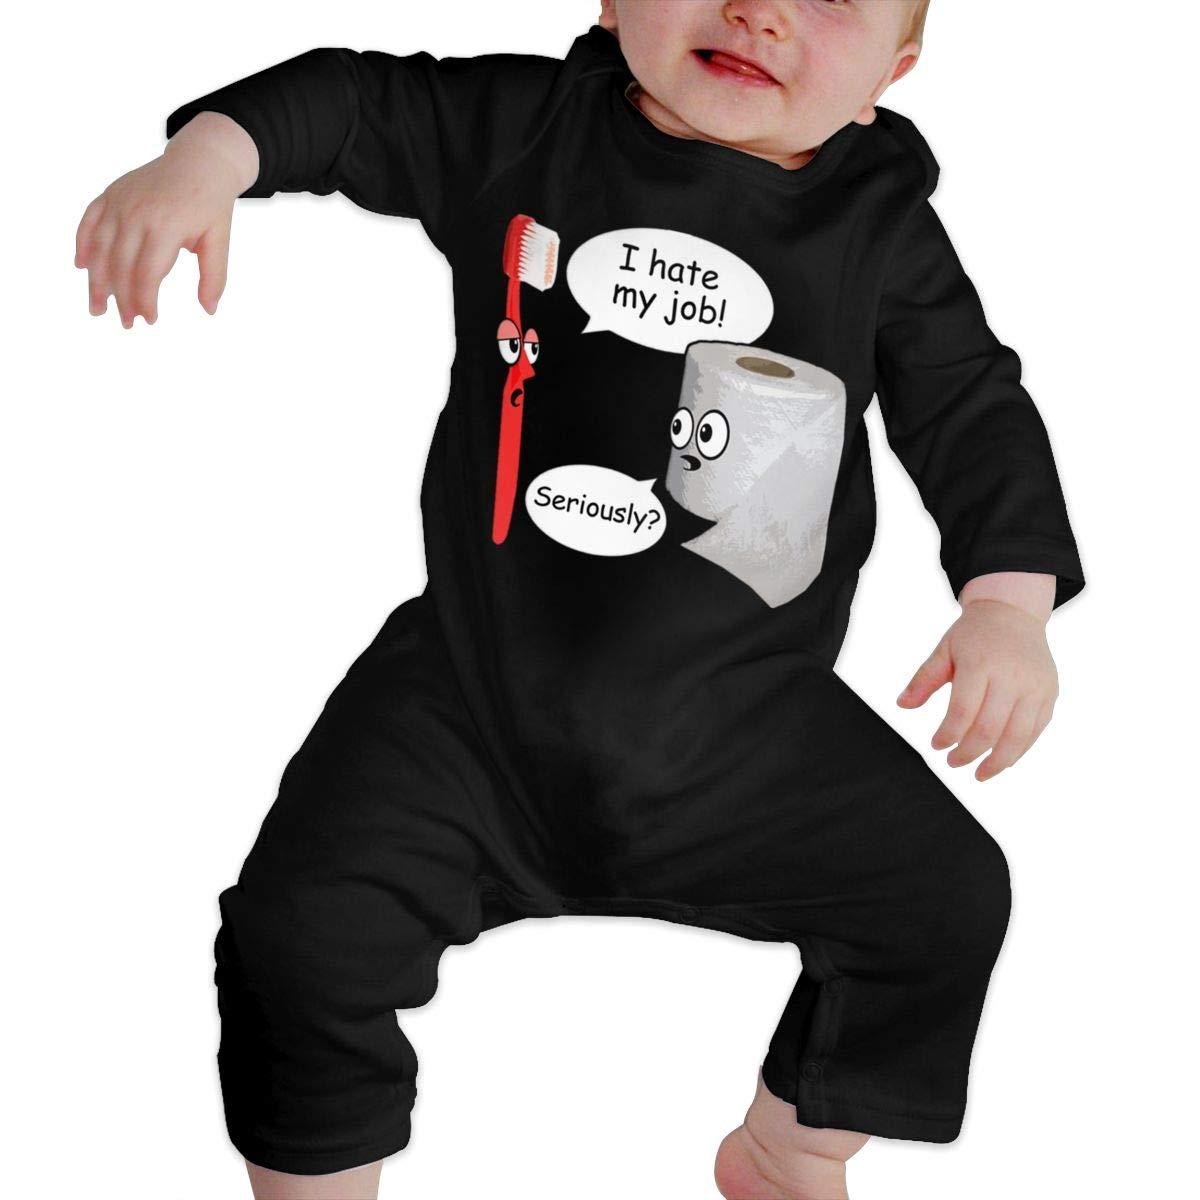 Mri-le1 Newborn Kids Coverall Florida Patriotic Turkey Thanksgiving Infant Long Sleeve Romper Jumpsuit